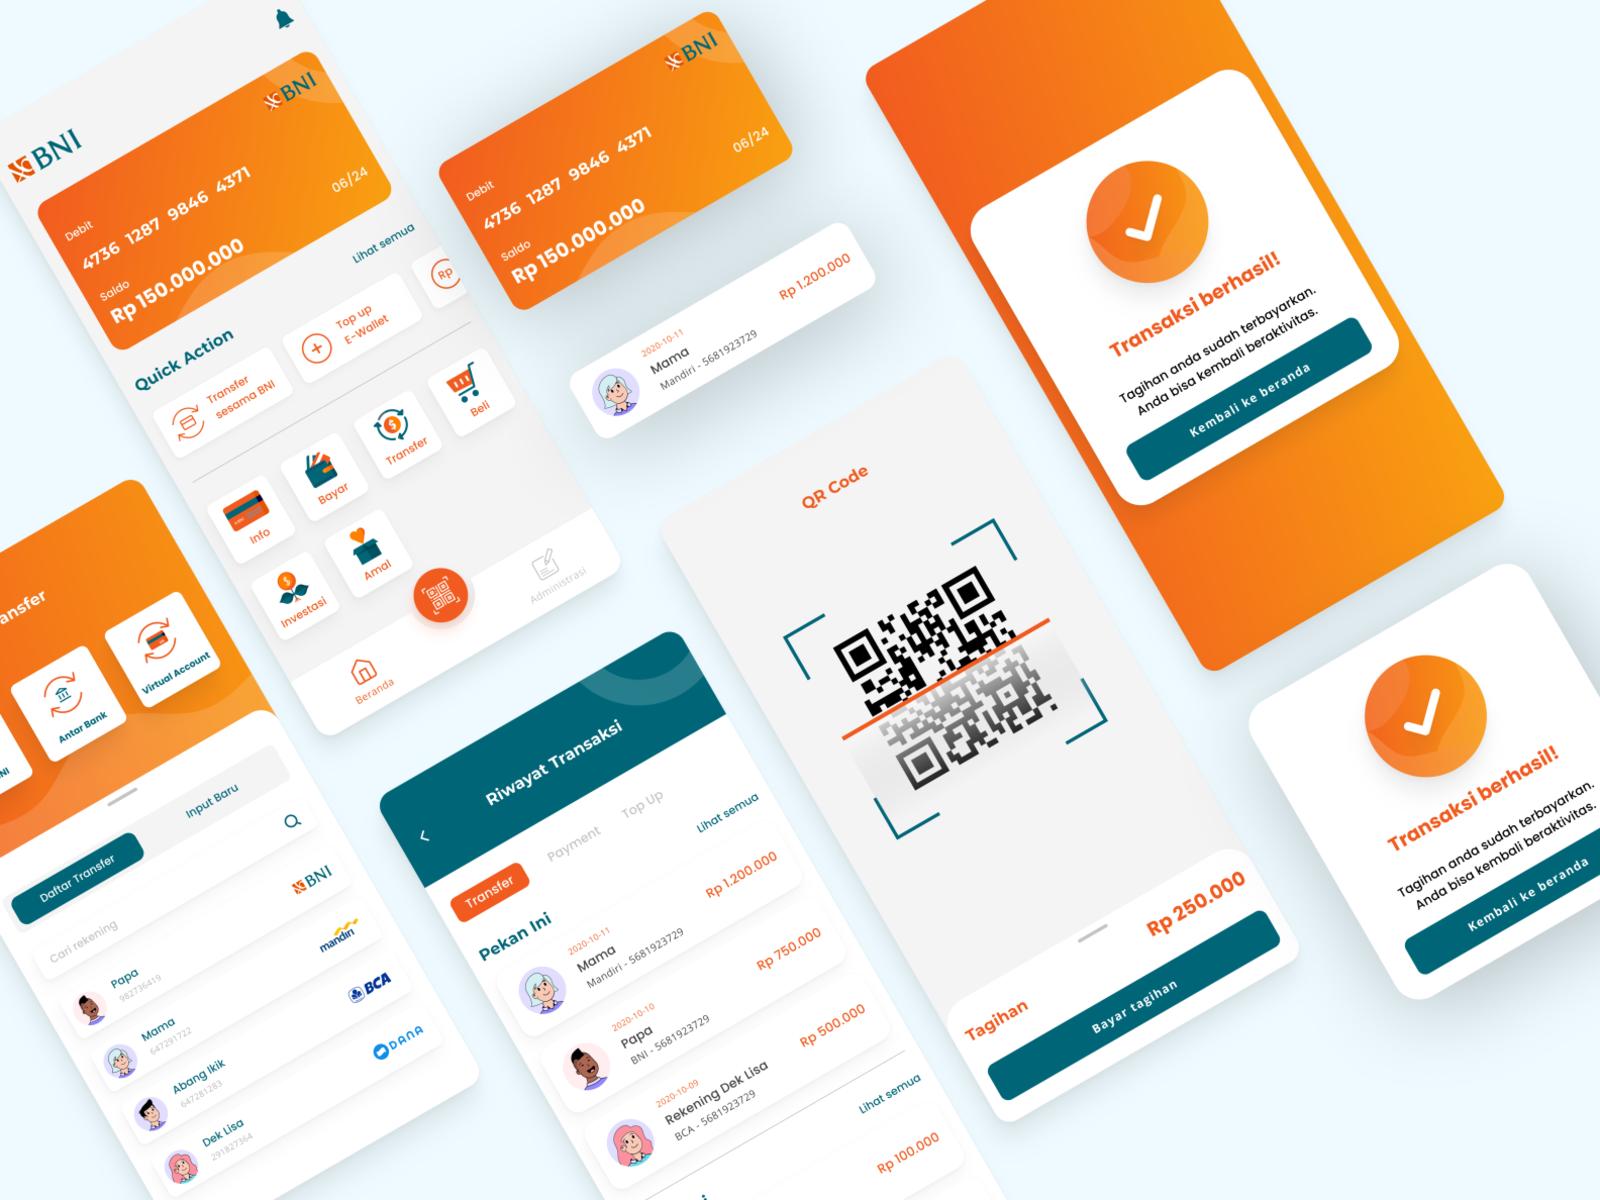 BNI Mobile Banking Redesign Concept by Rifki Akbar on Dribbble